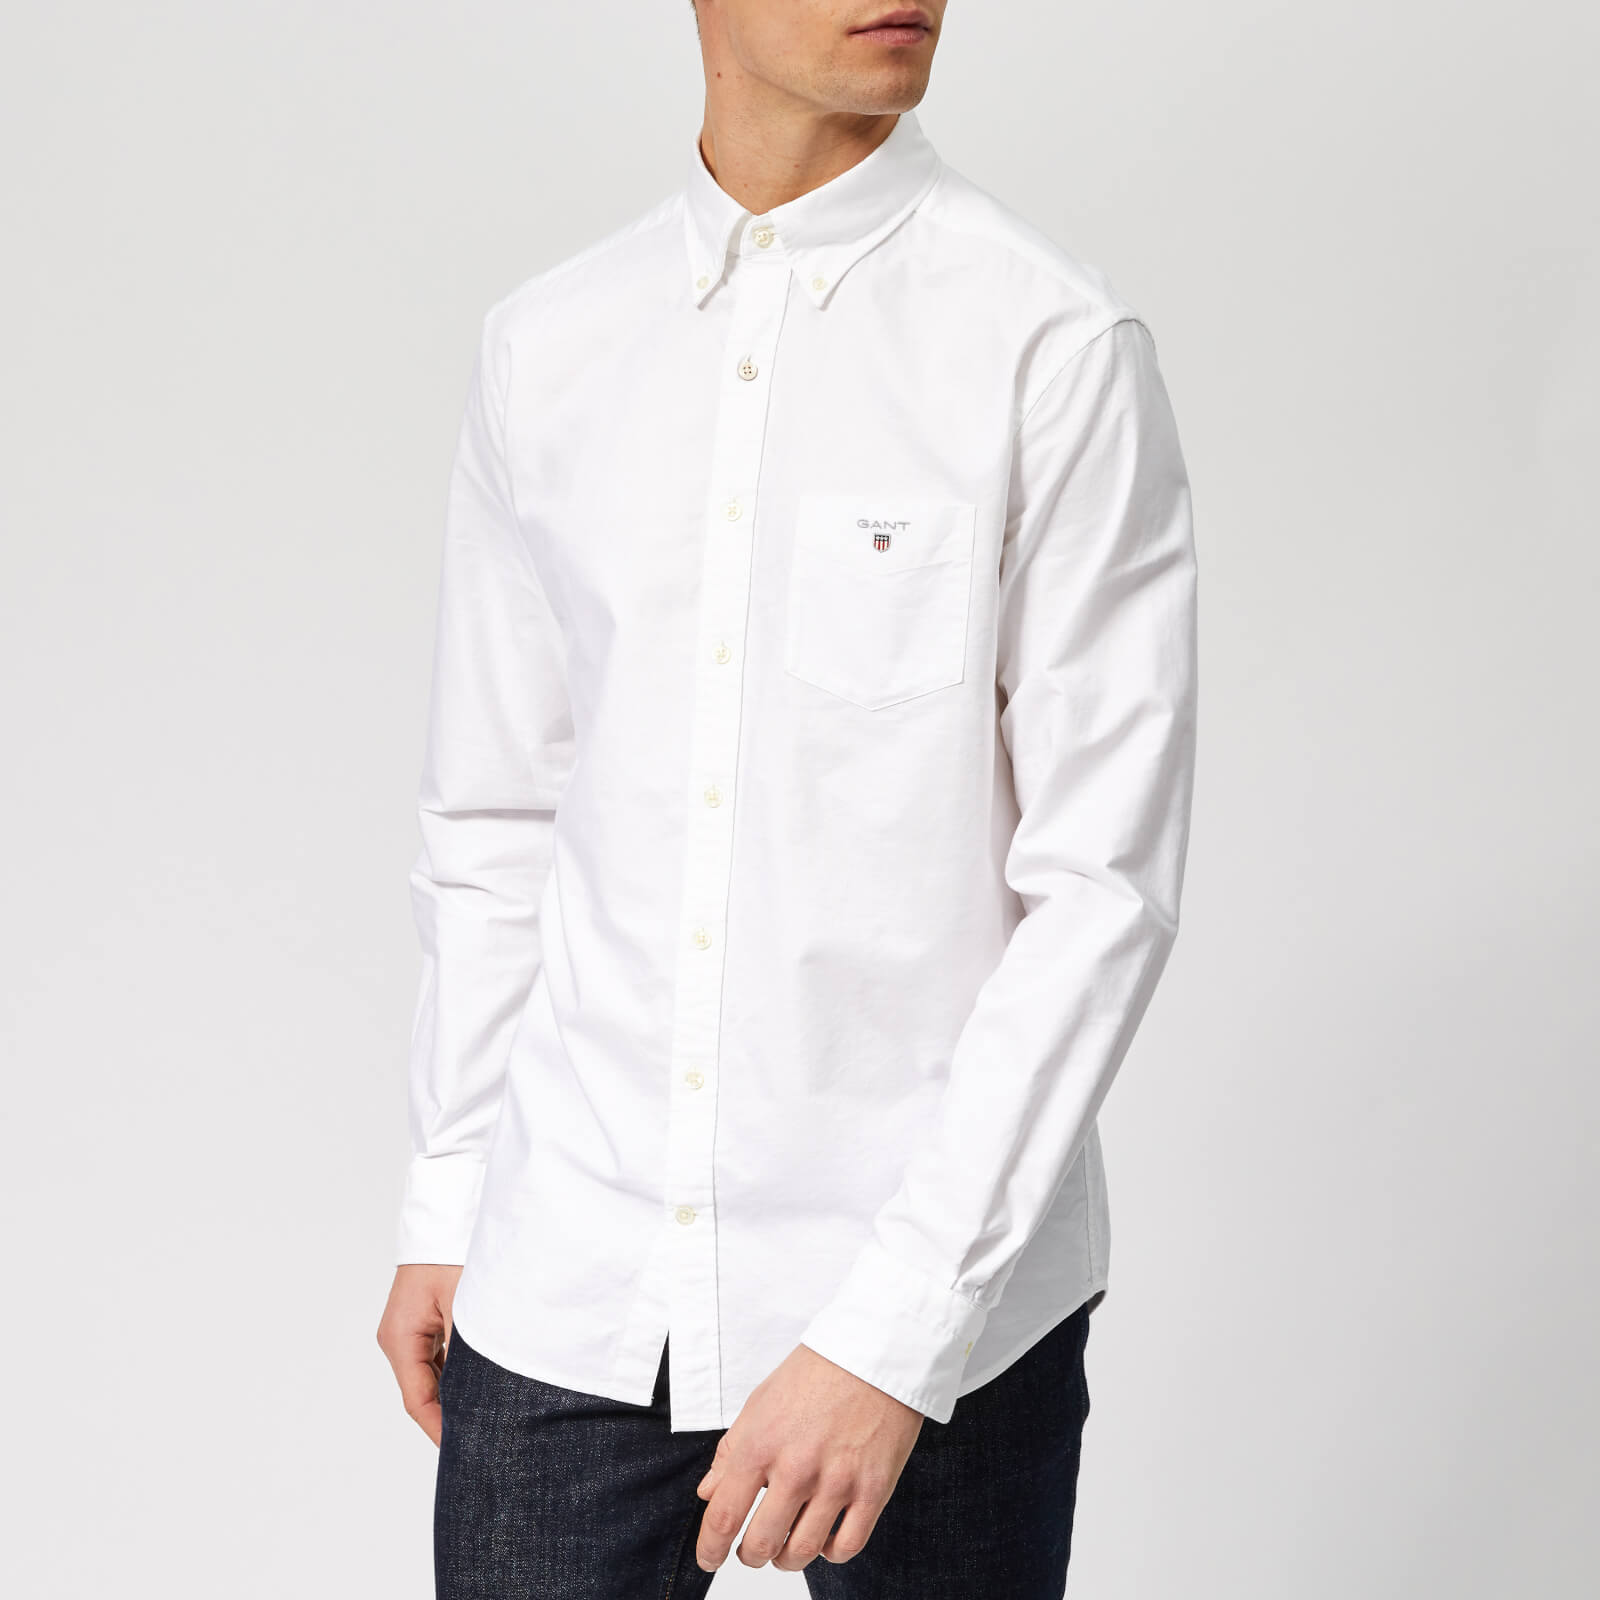 551f7f85b GANT Men's Regular Fit Oxford Shirt - White